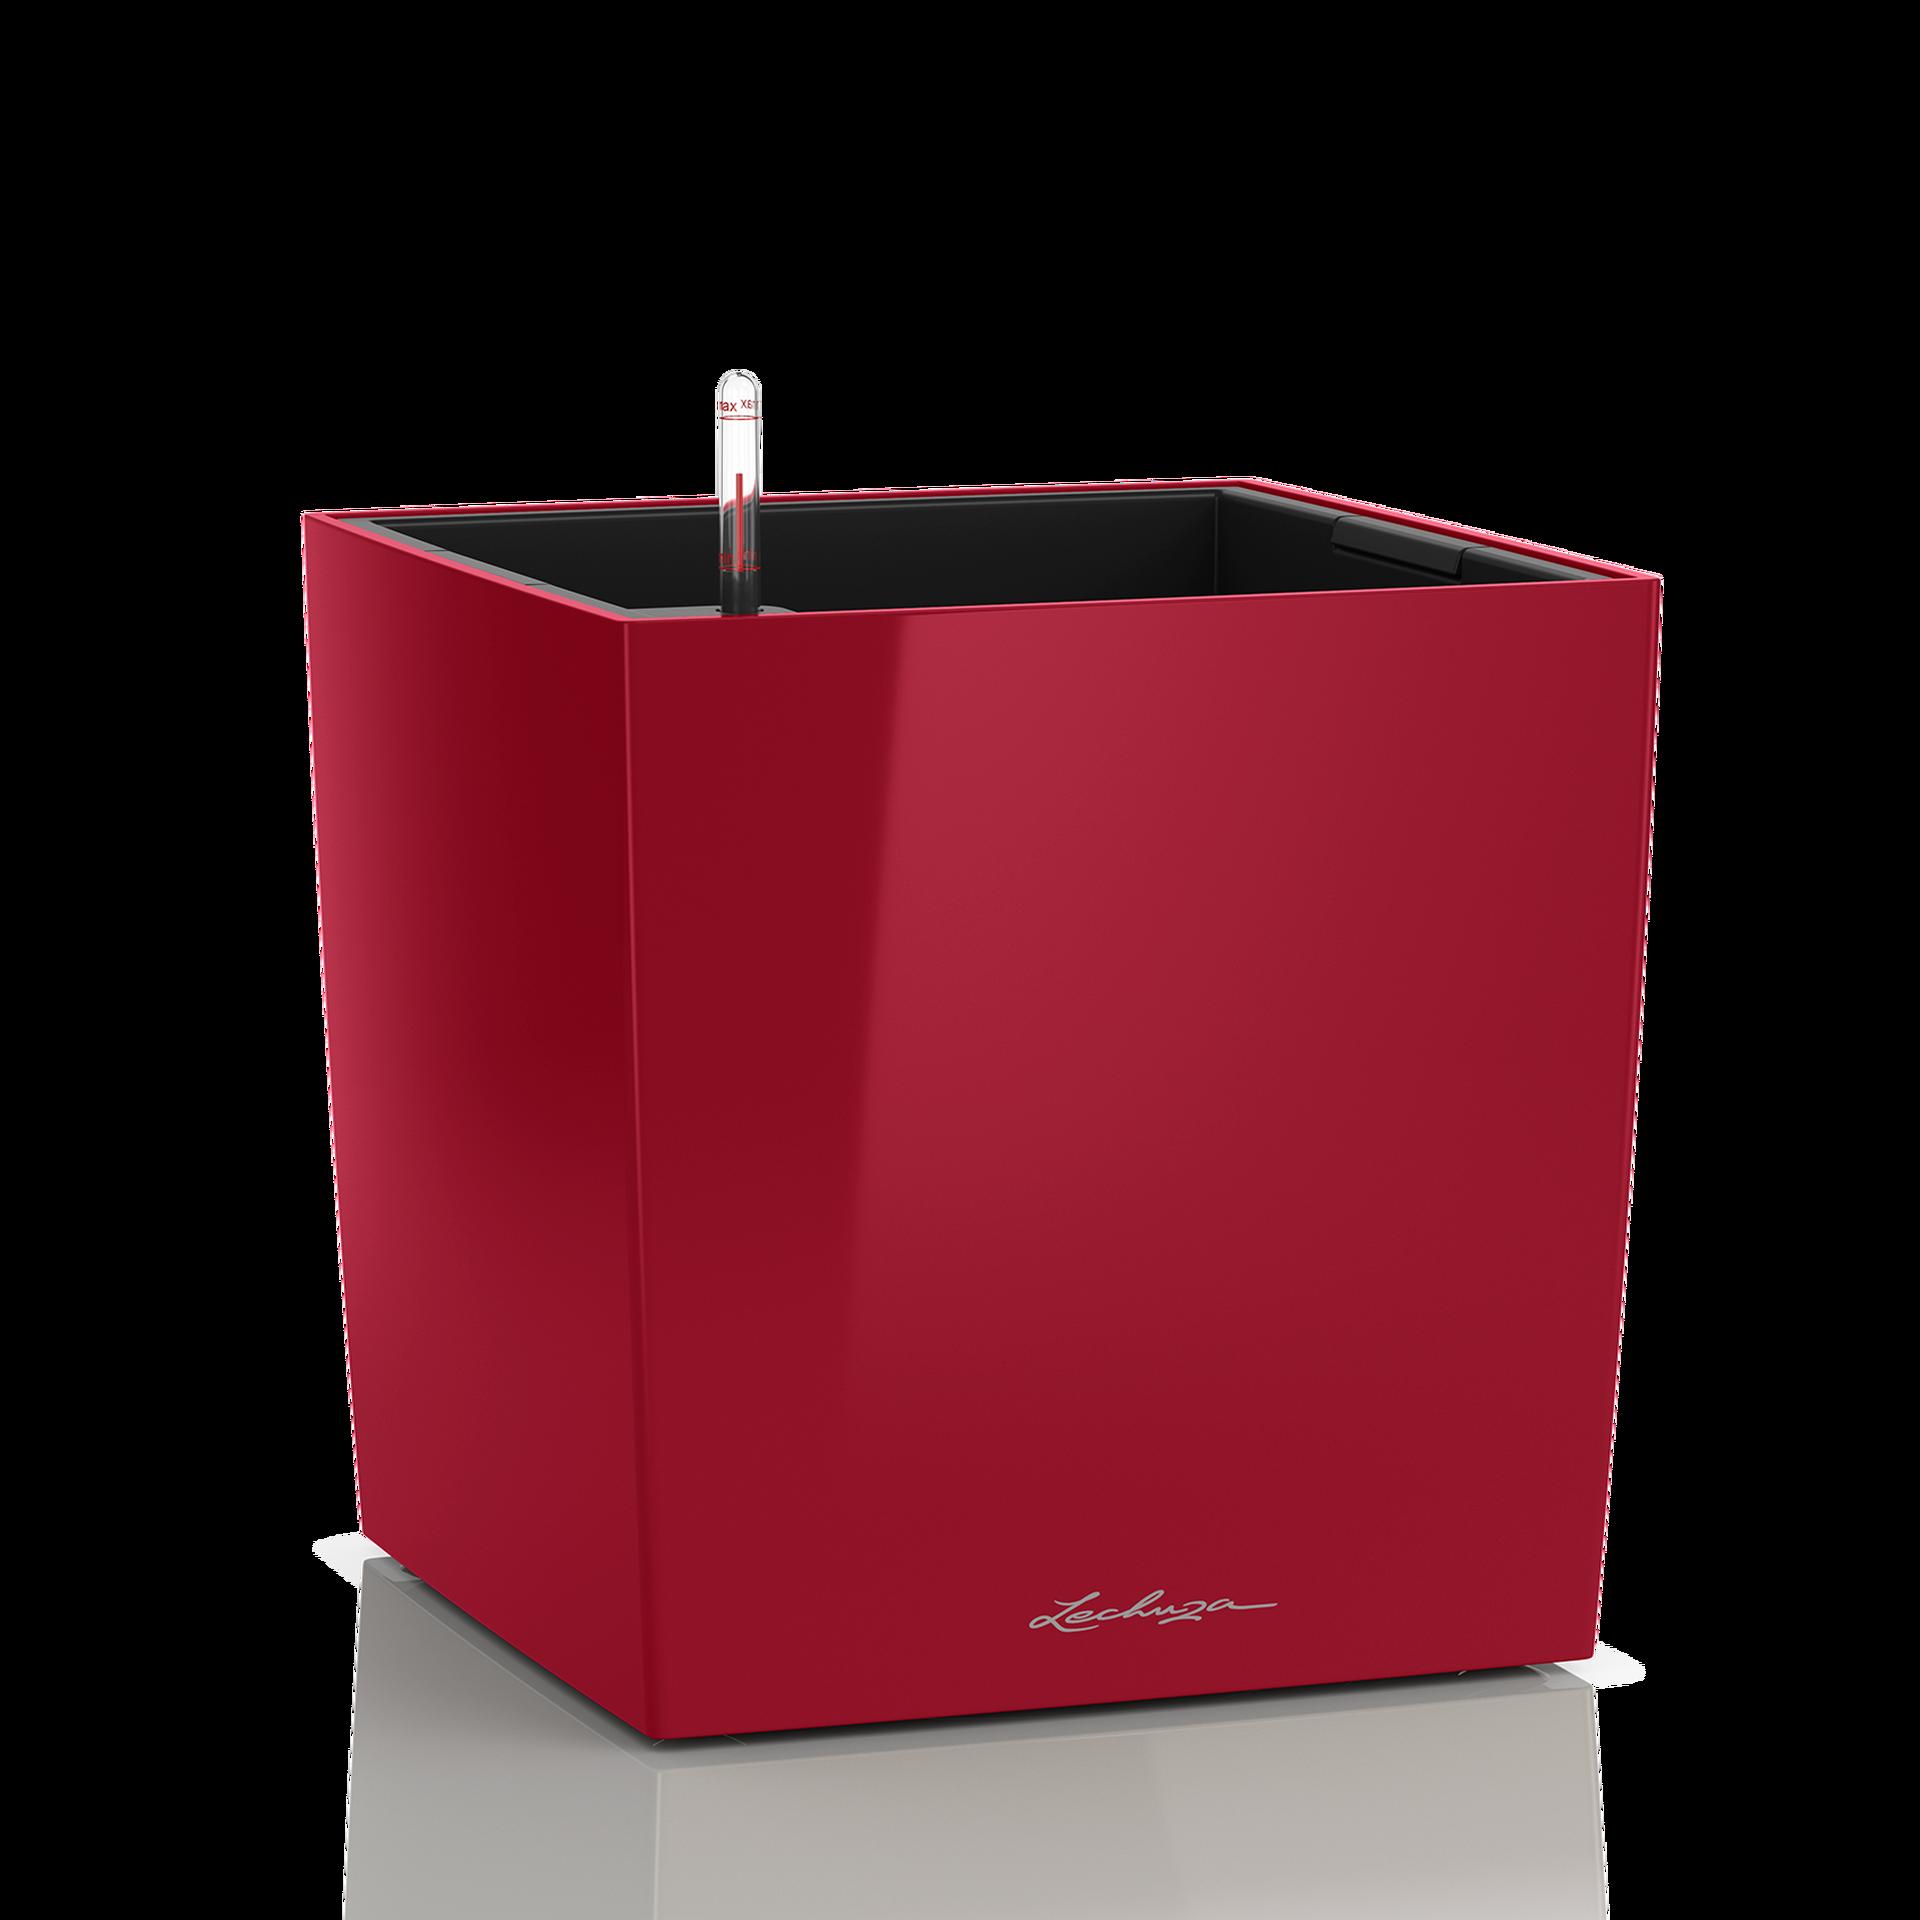 CUBE 30 rouge scarlet brillant